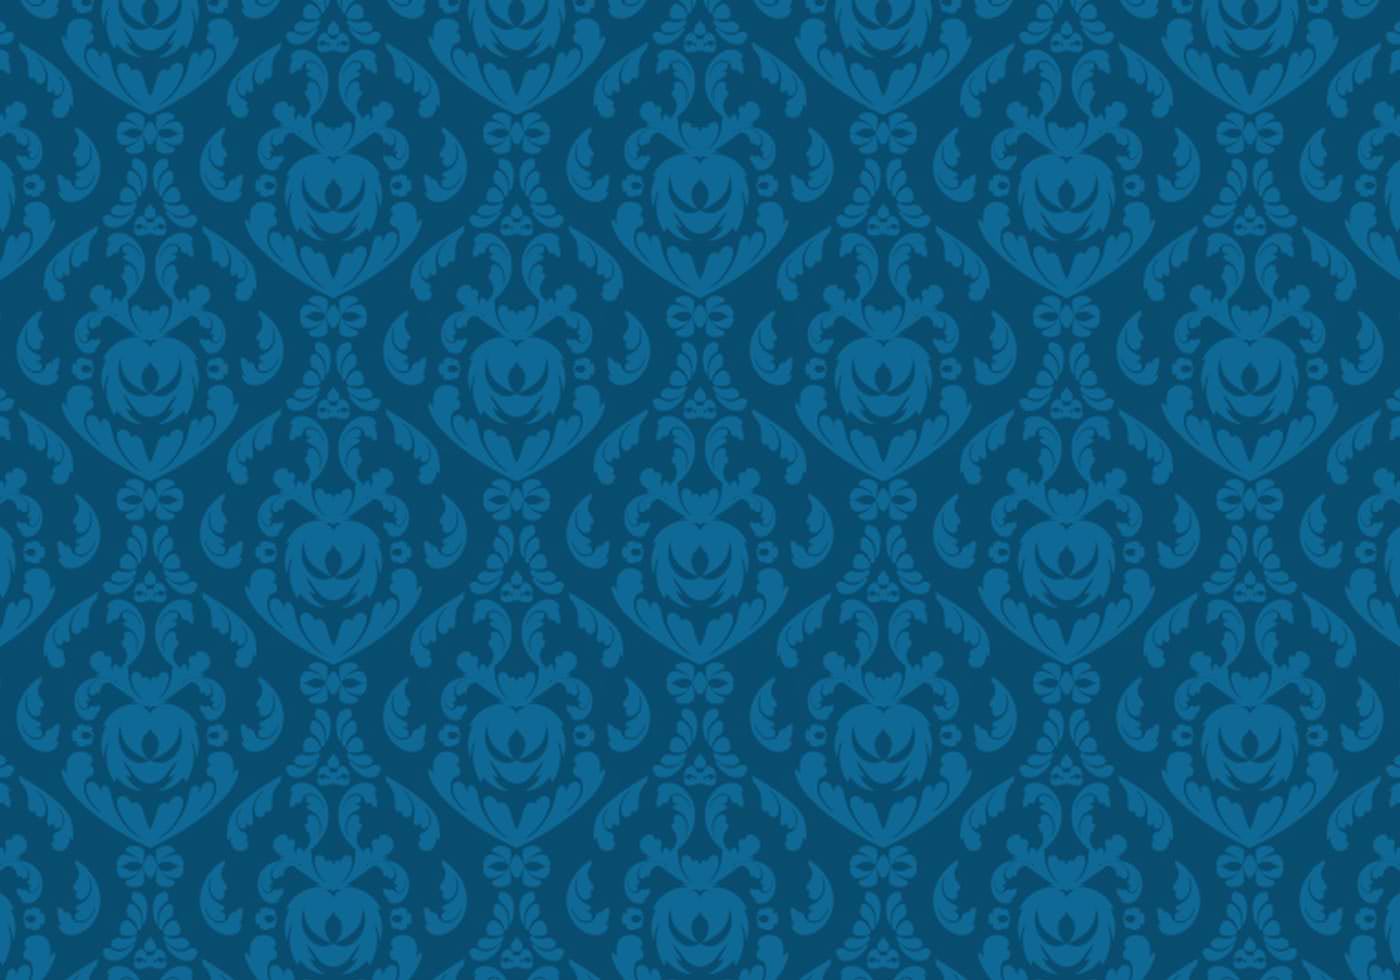 Decorative damask Wallpaper Pattern